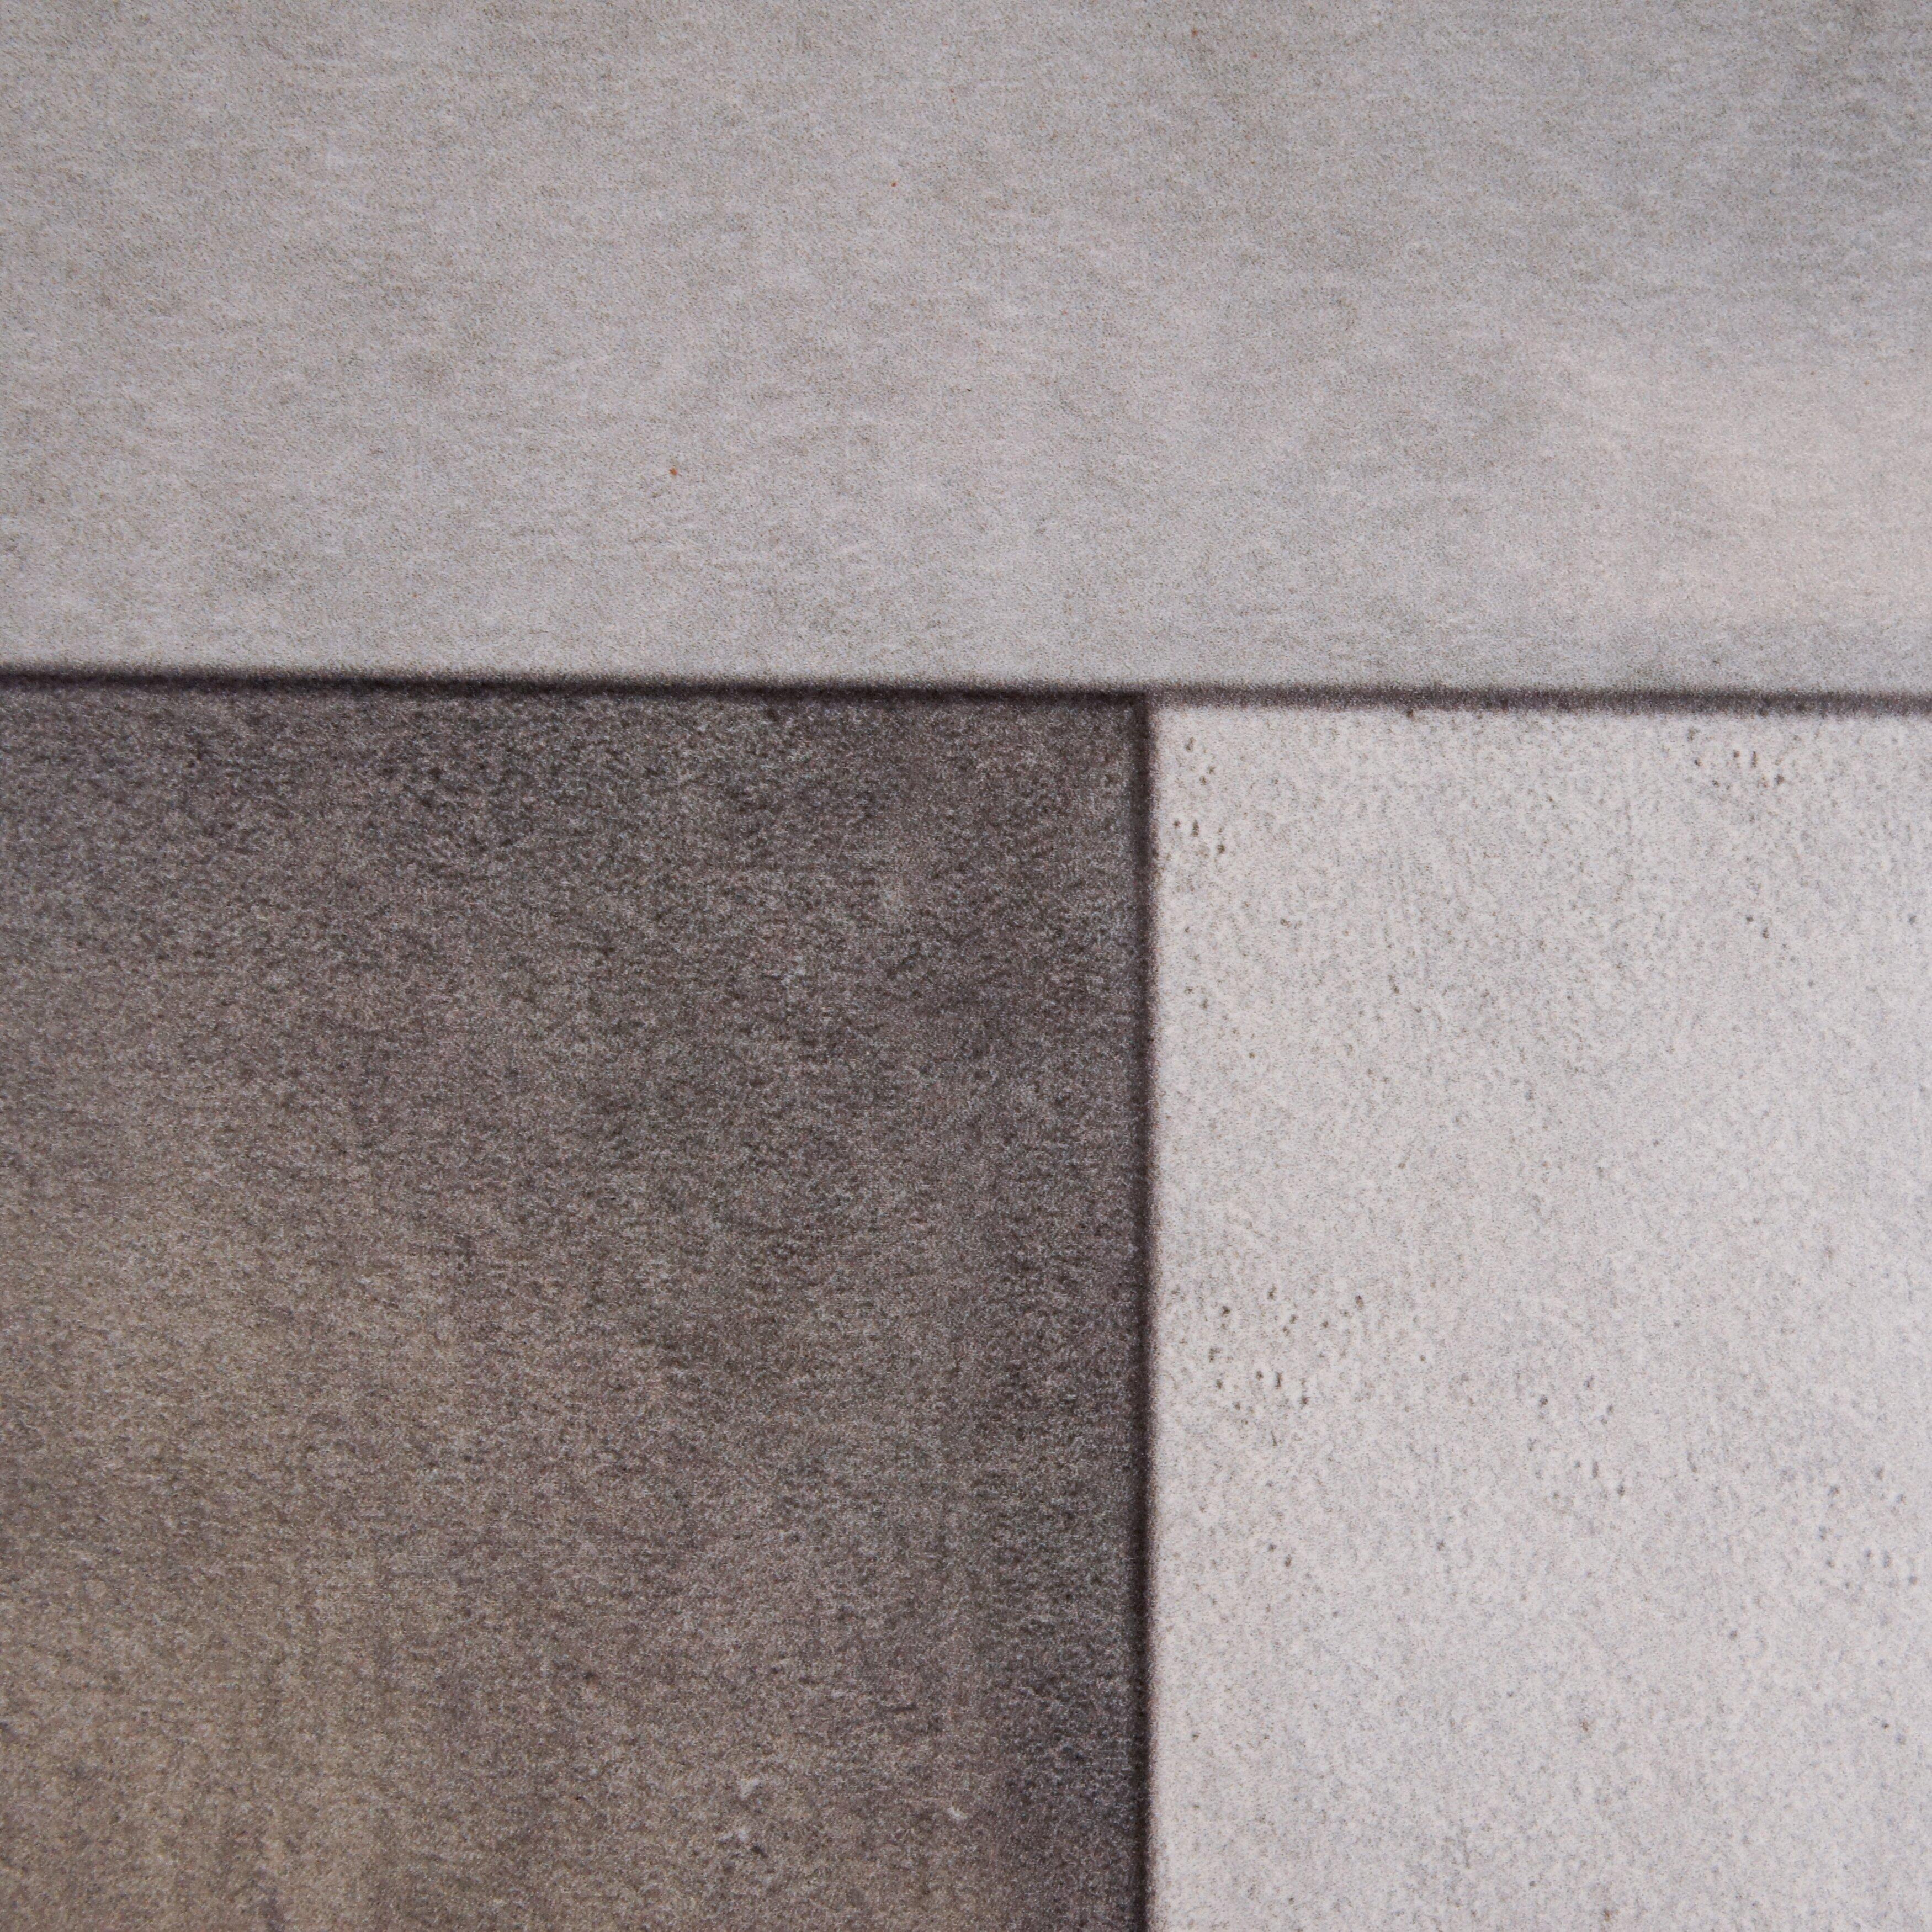 Floor Tile 8 X 8 Ceramic Floor Tile